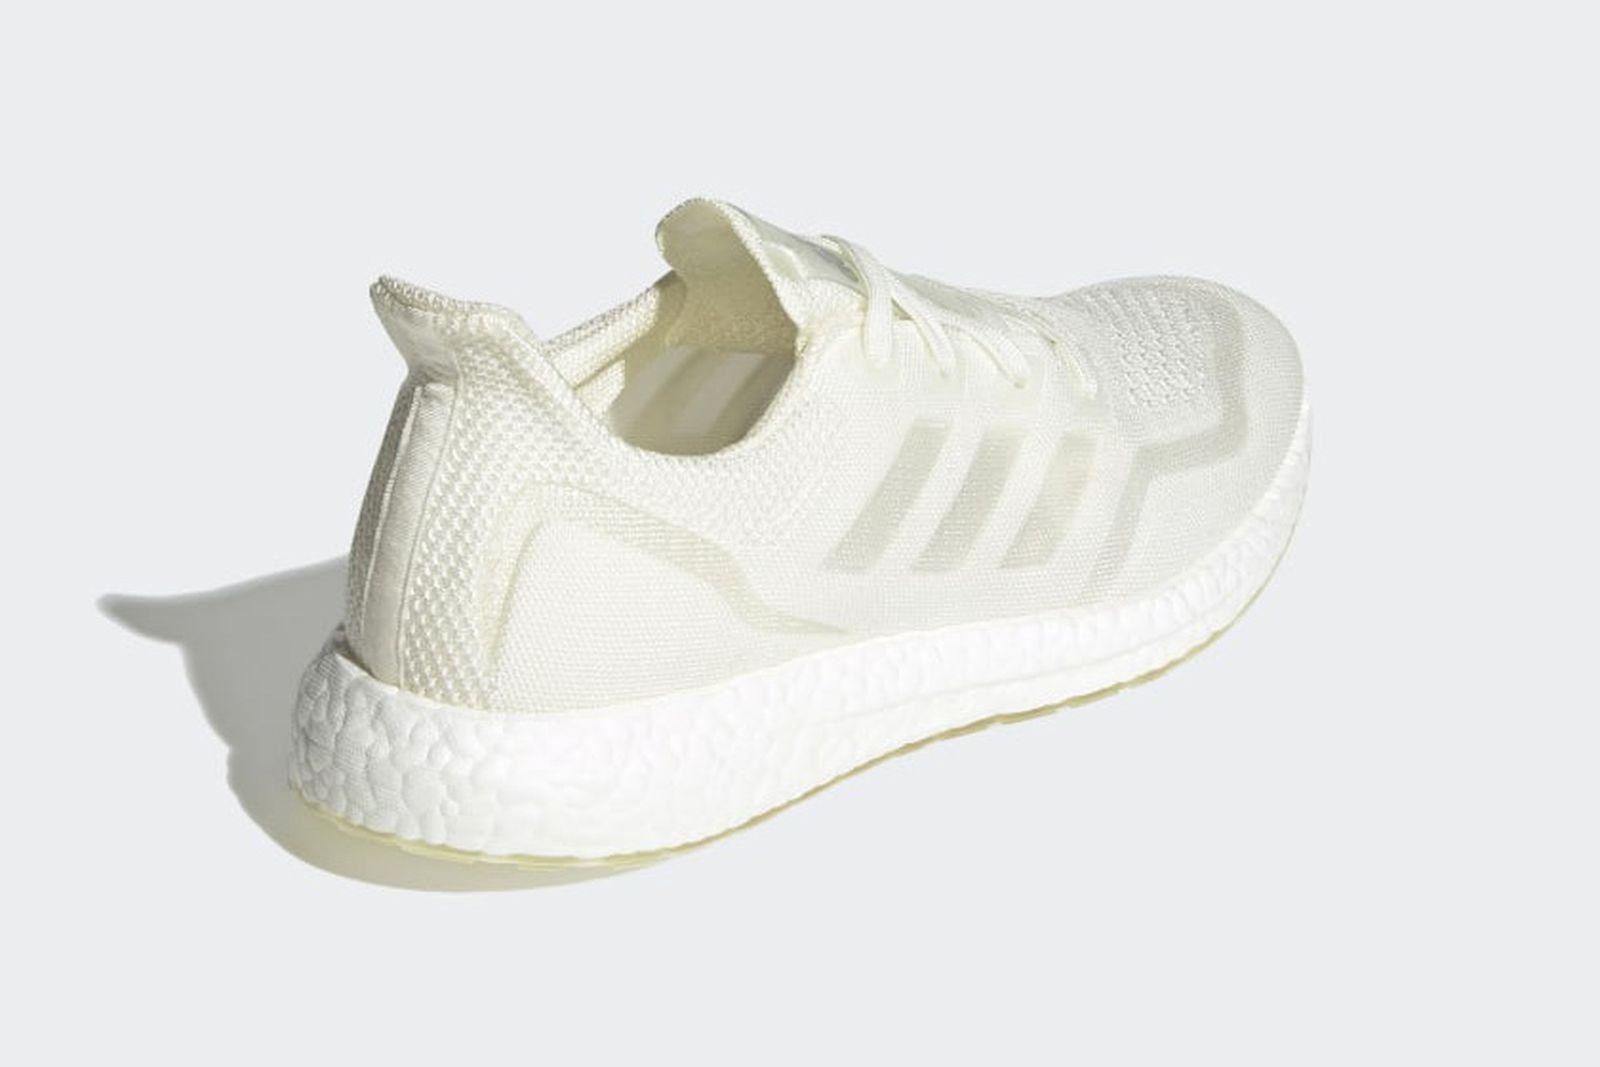 adidas-futurecraft-loop-release-date-price-1-05